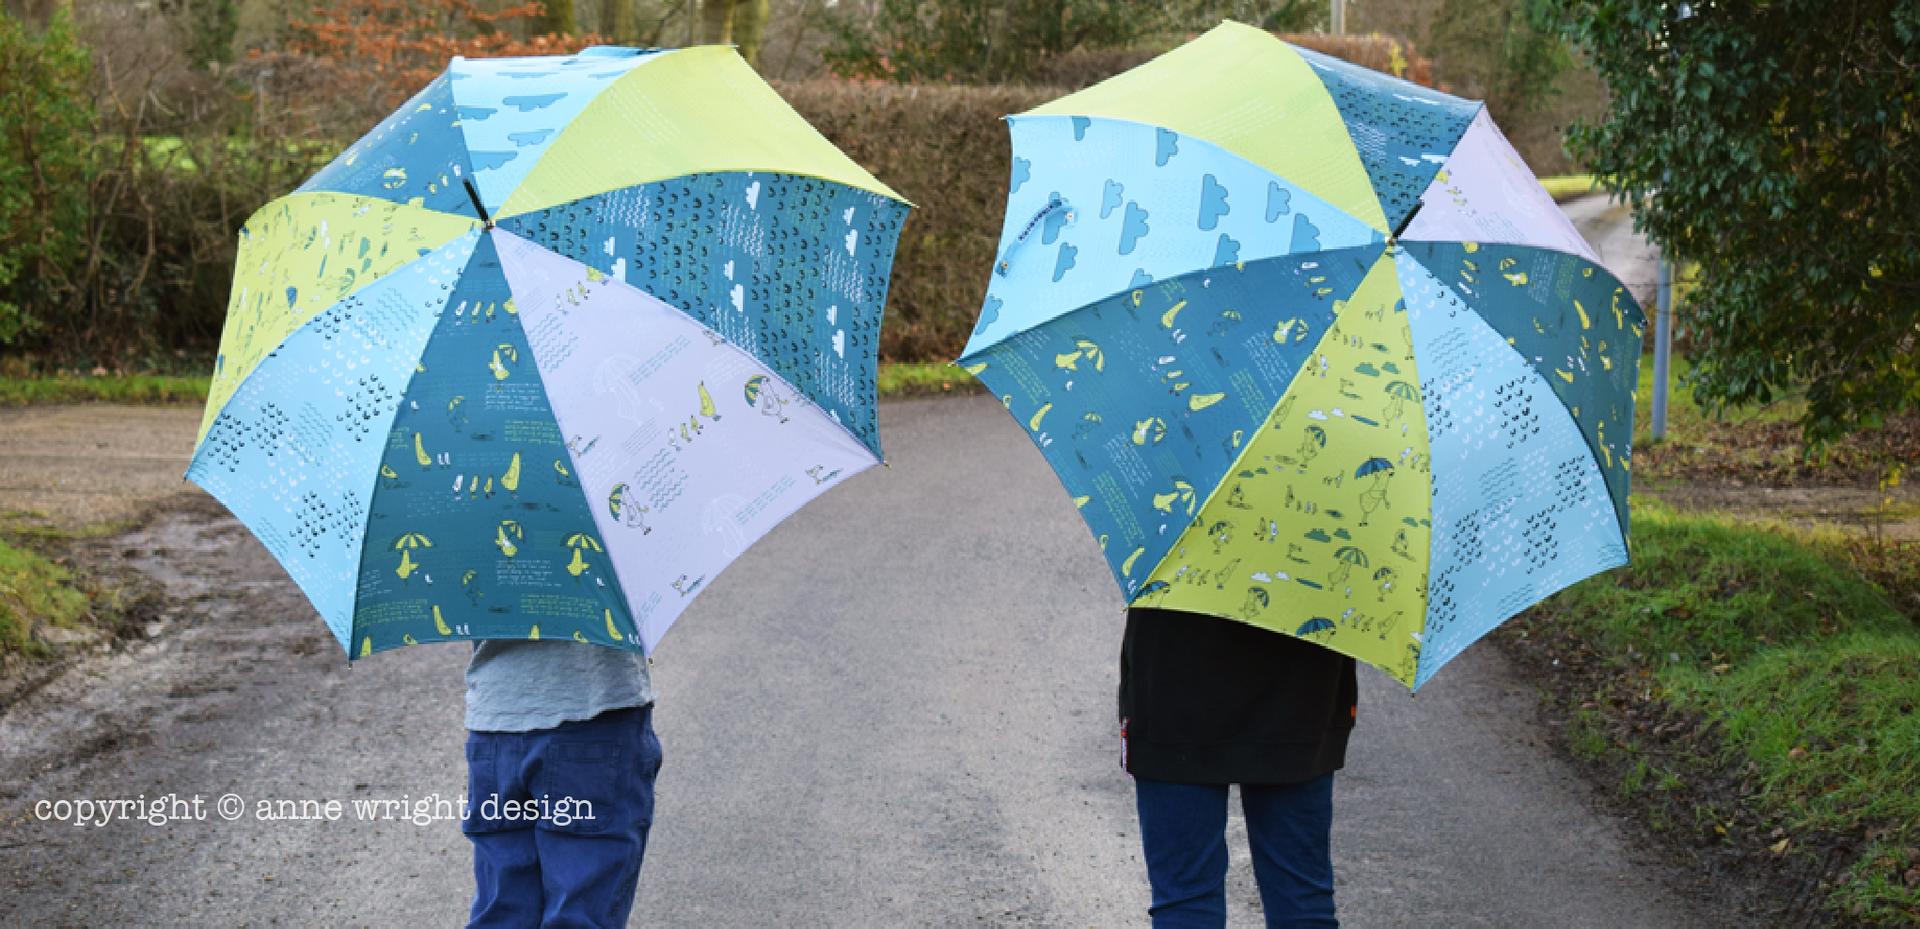 Nice Weather for Ducks Pattern on Umbrellas